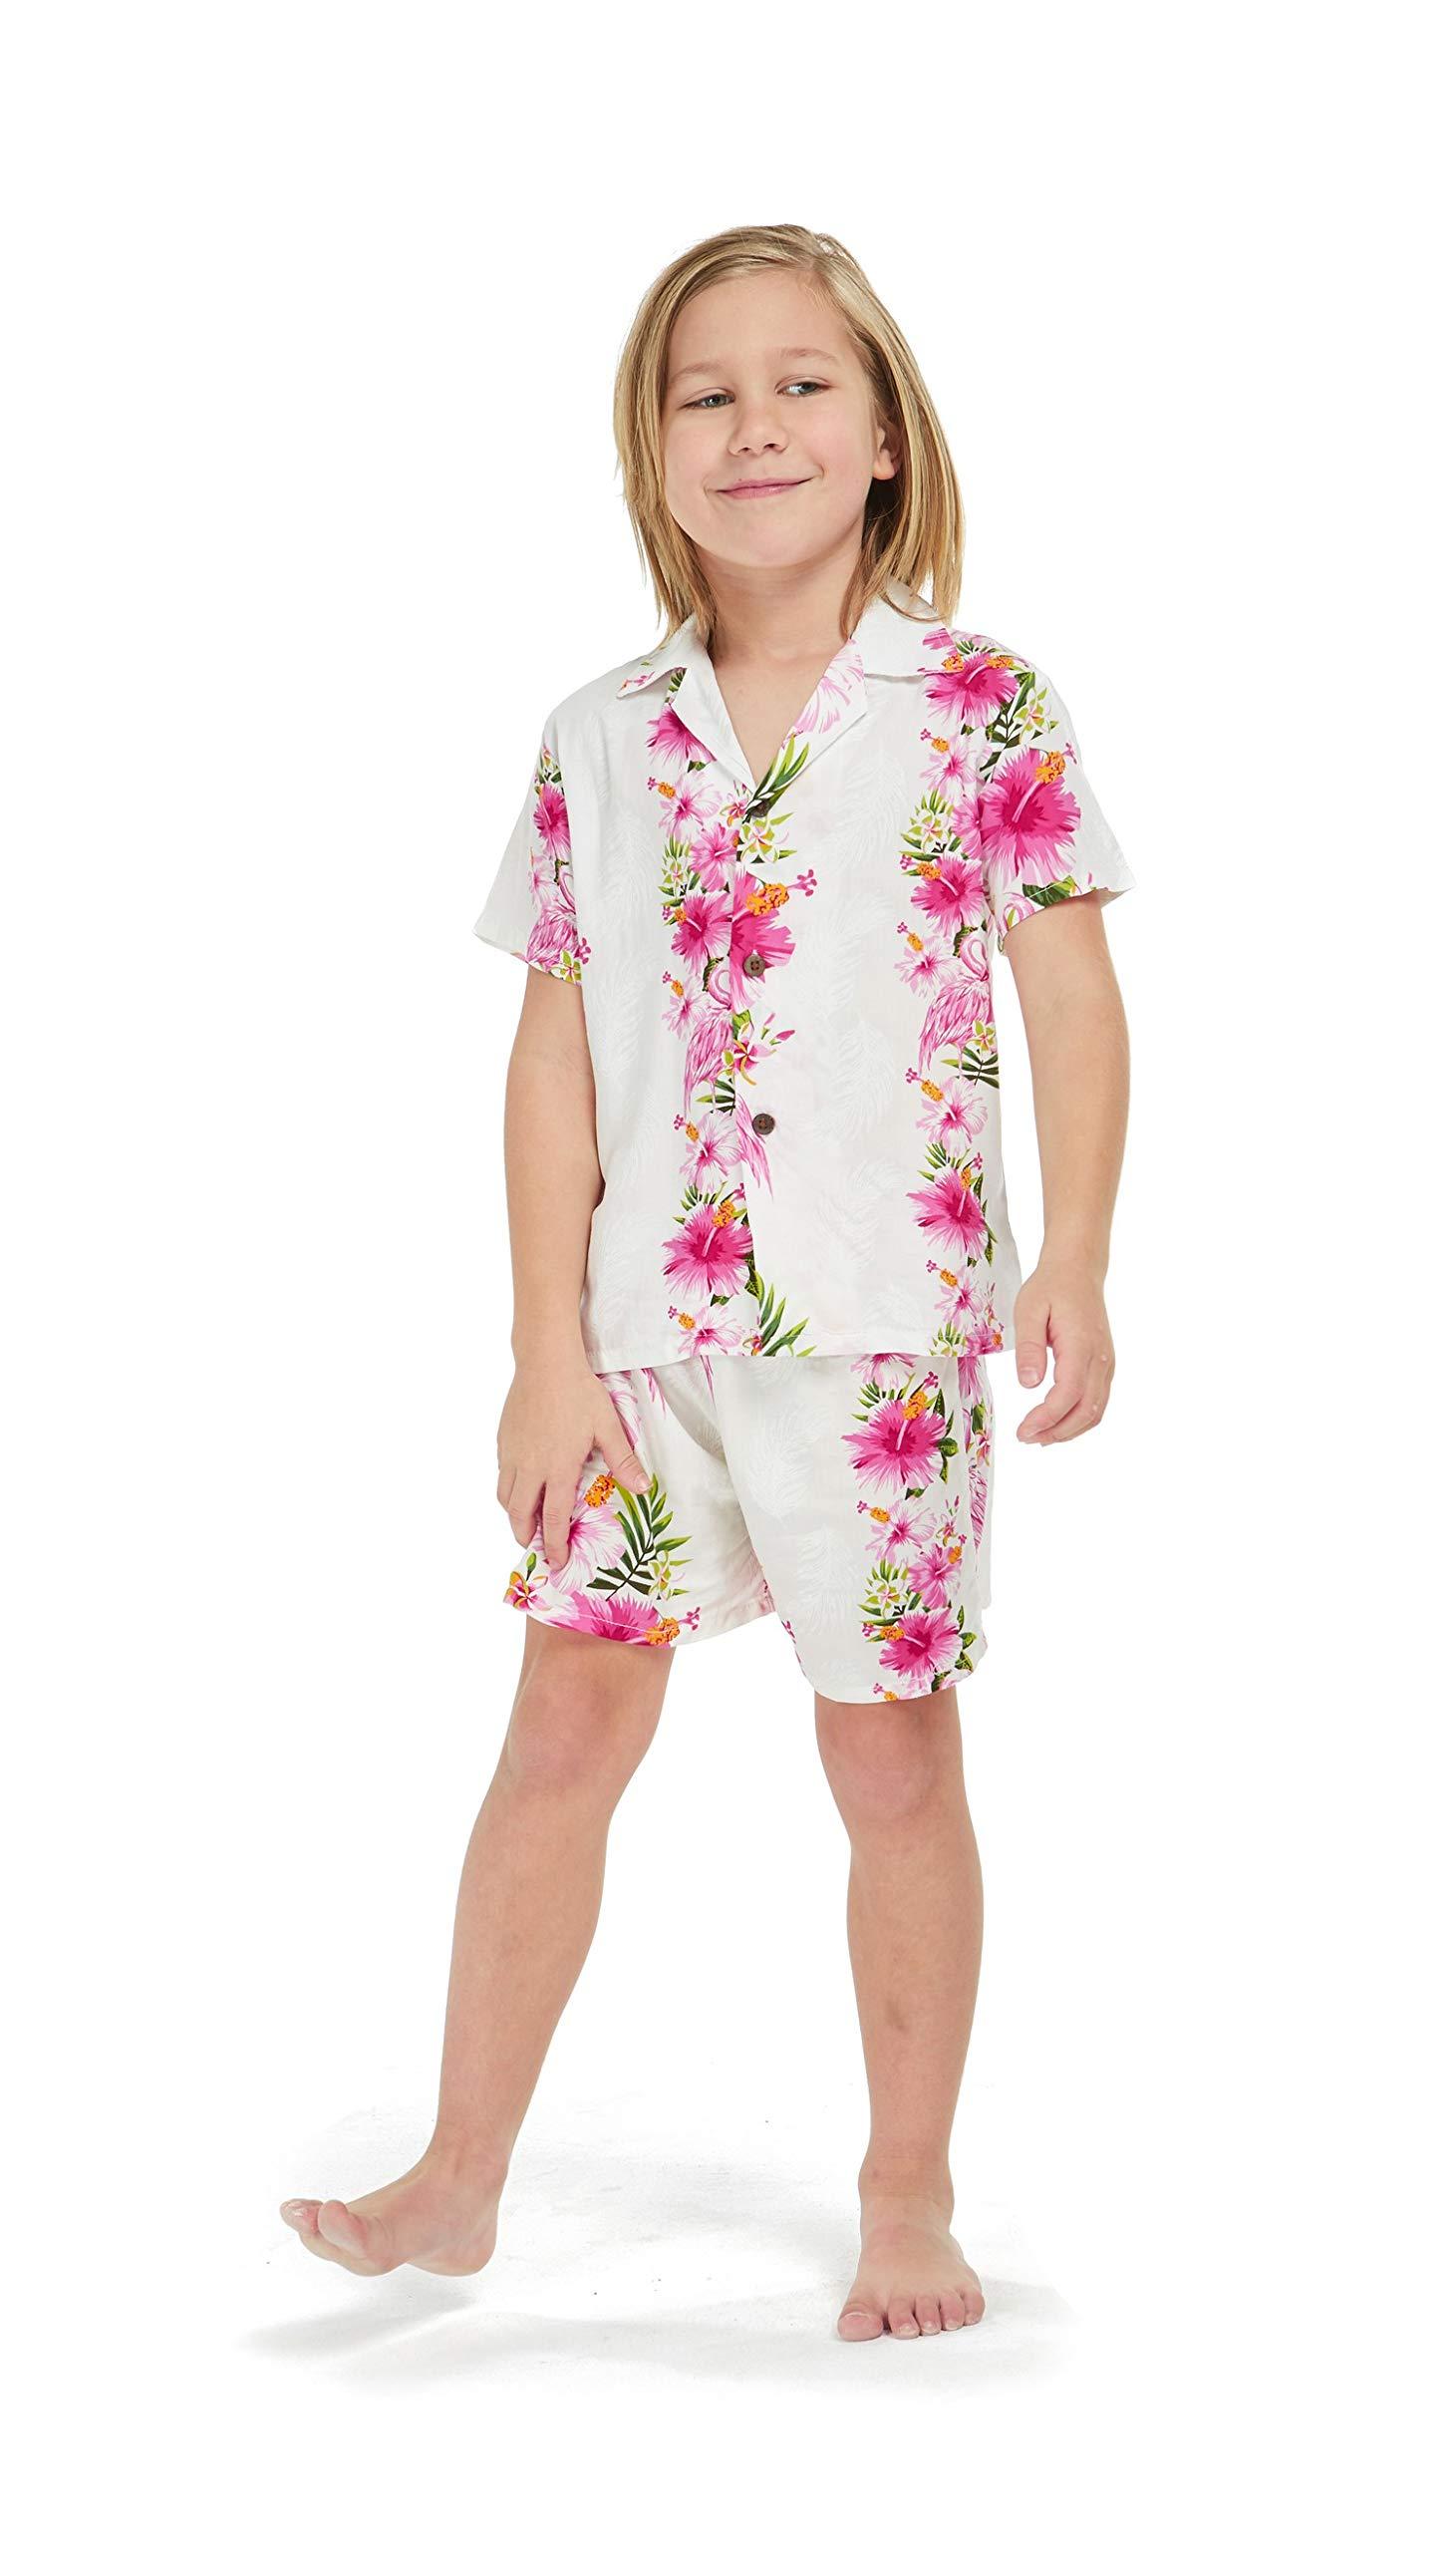 Hawaii Hangover Boy Young Adult Aloha Luau Shirt in Pink Hibiscus Vine 10 Year Old by Hawaii Hangover (Image #1)